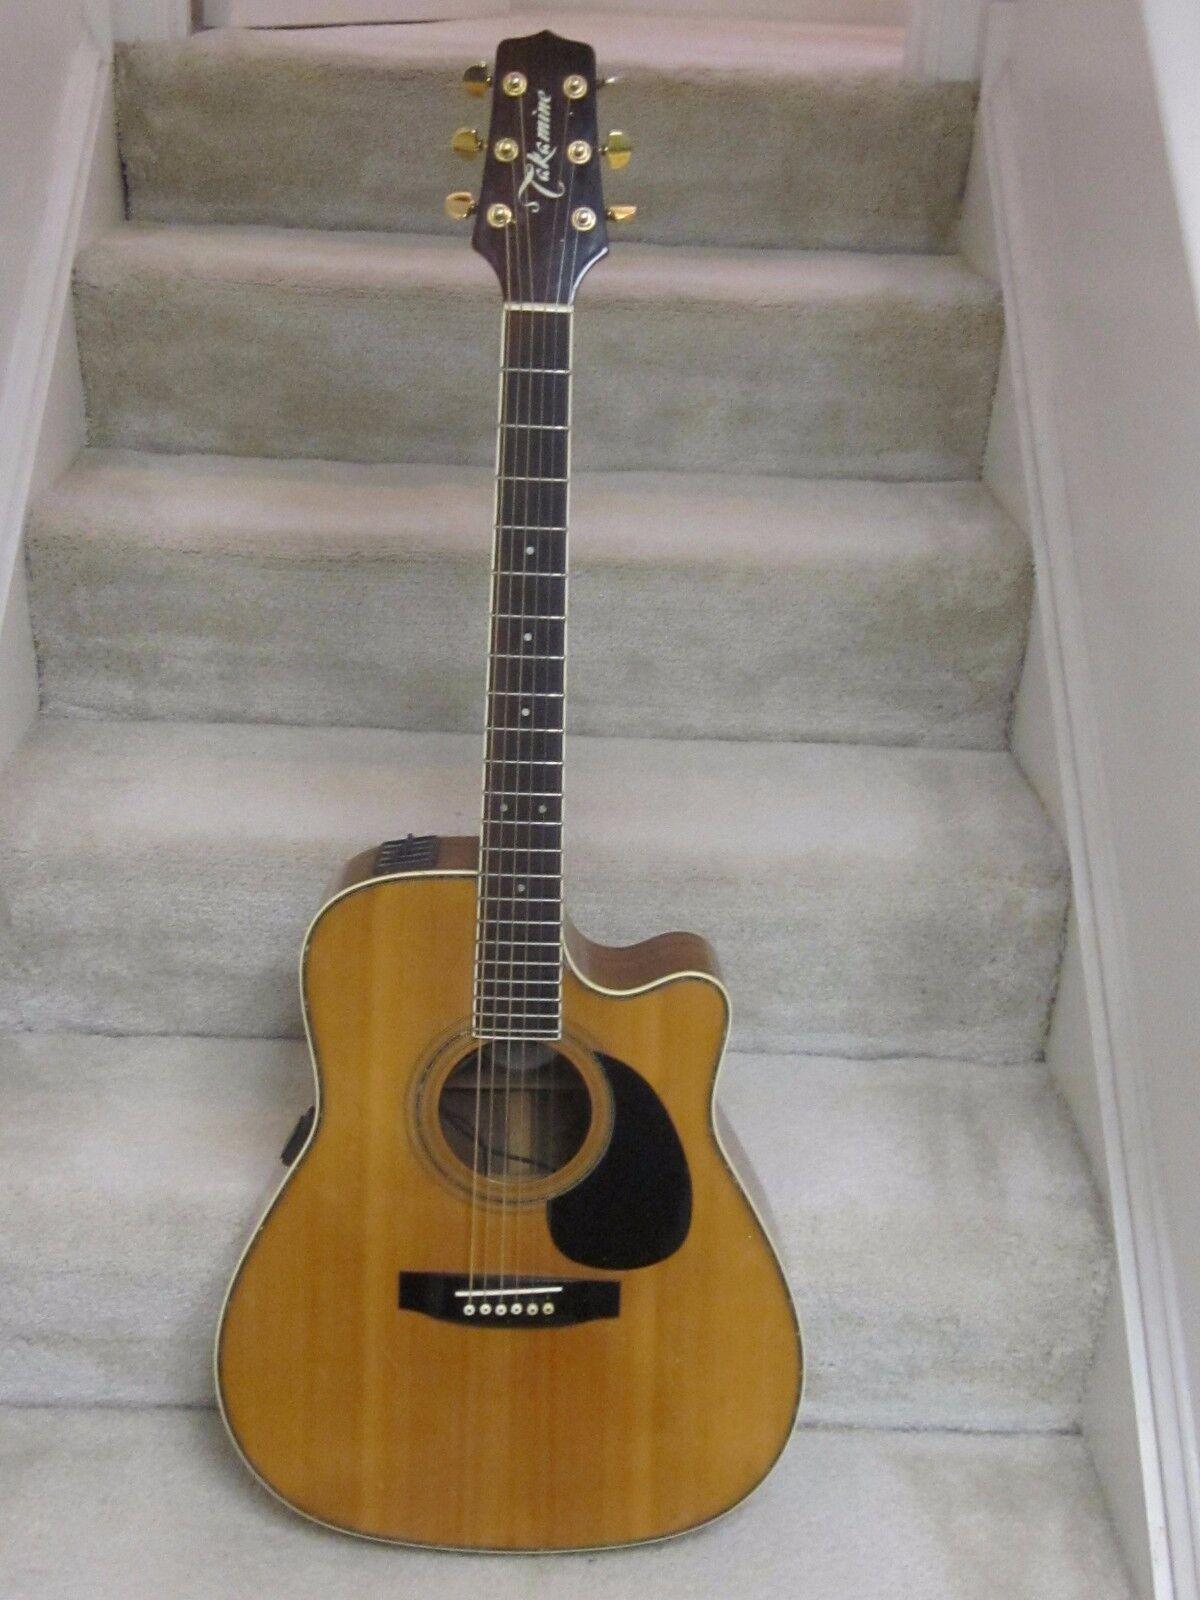 takamine eg 334c acoustic electric guitar nice cutaway jumbo new used girtars for sale. Black Bedroom Furniture Sets. Home Design Ideas